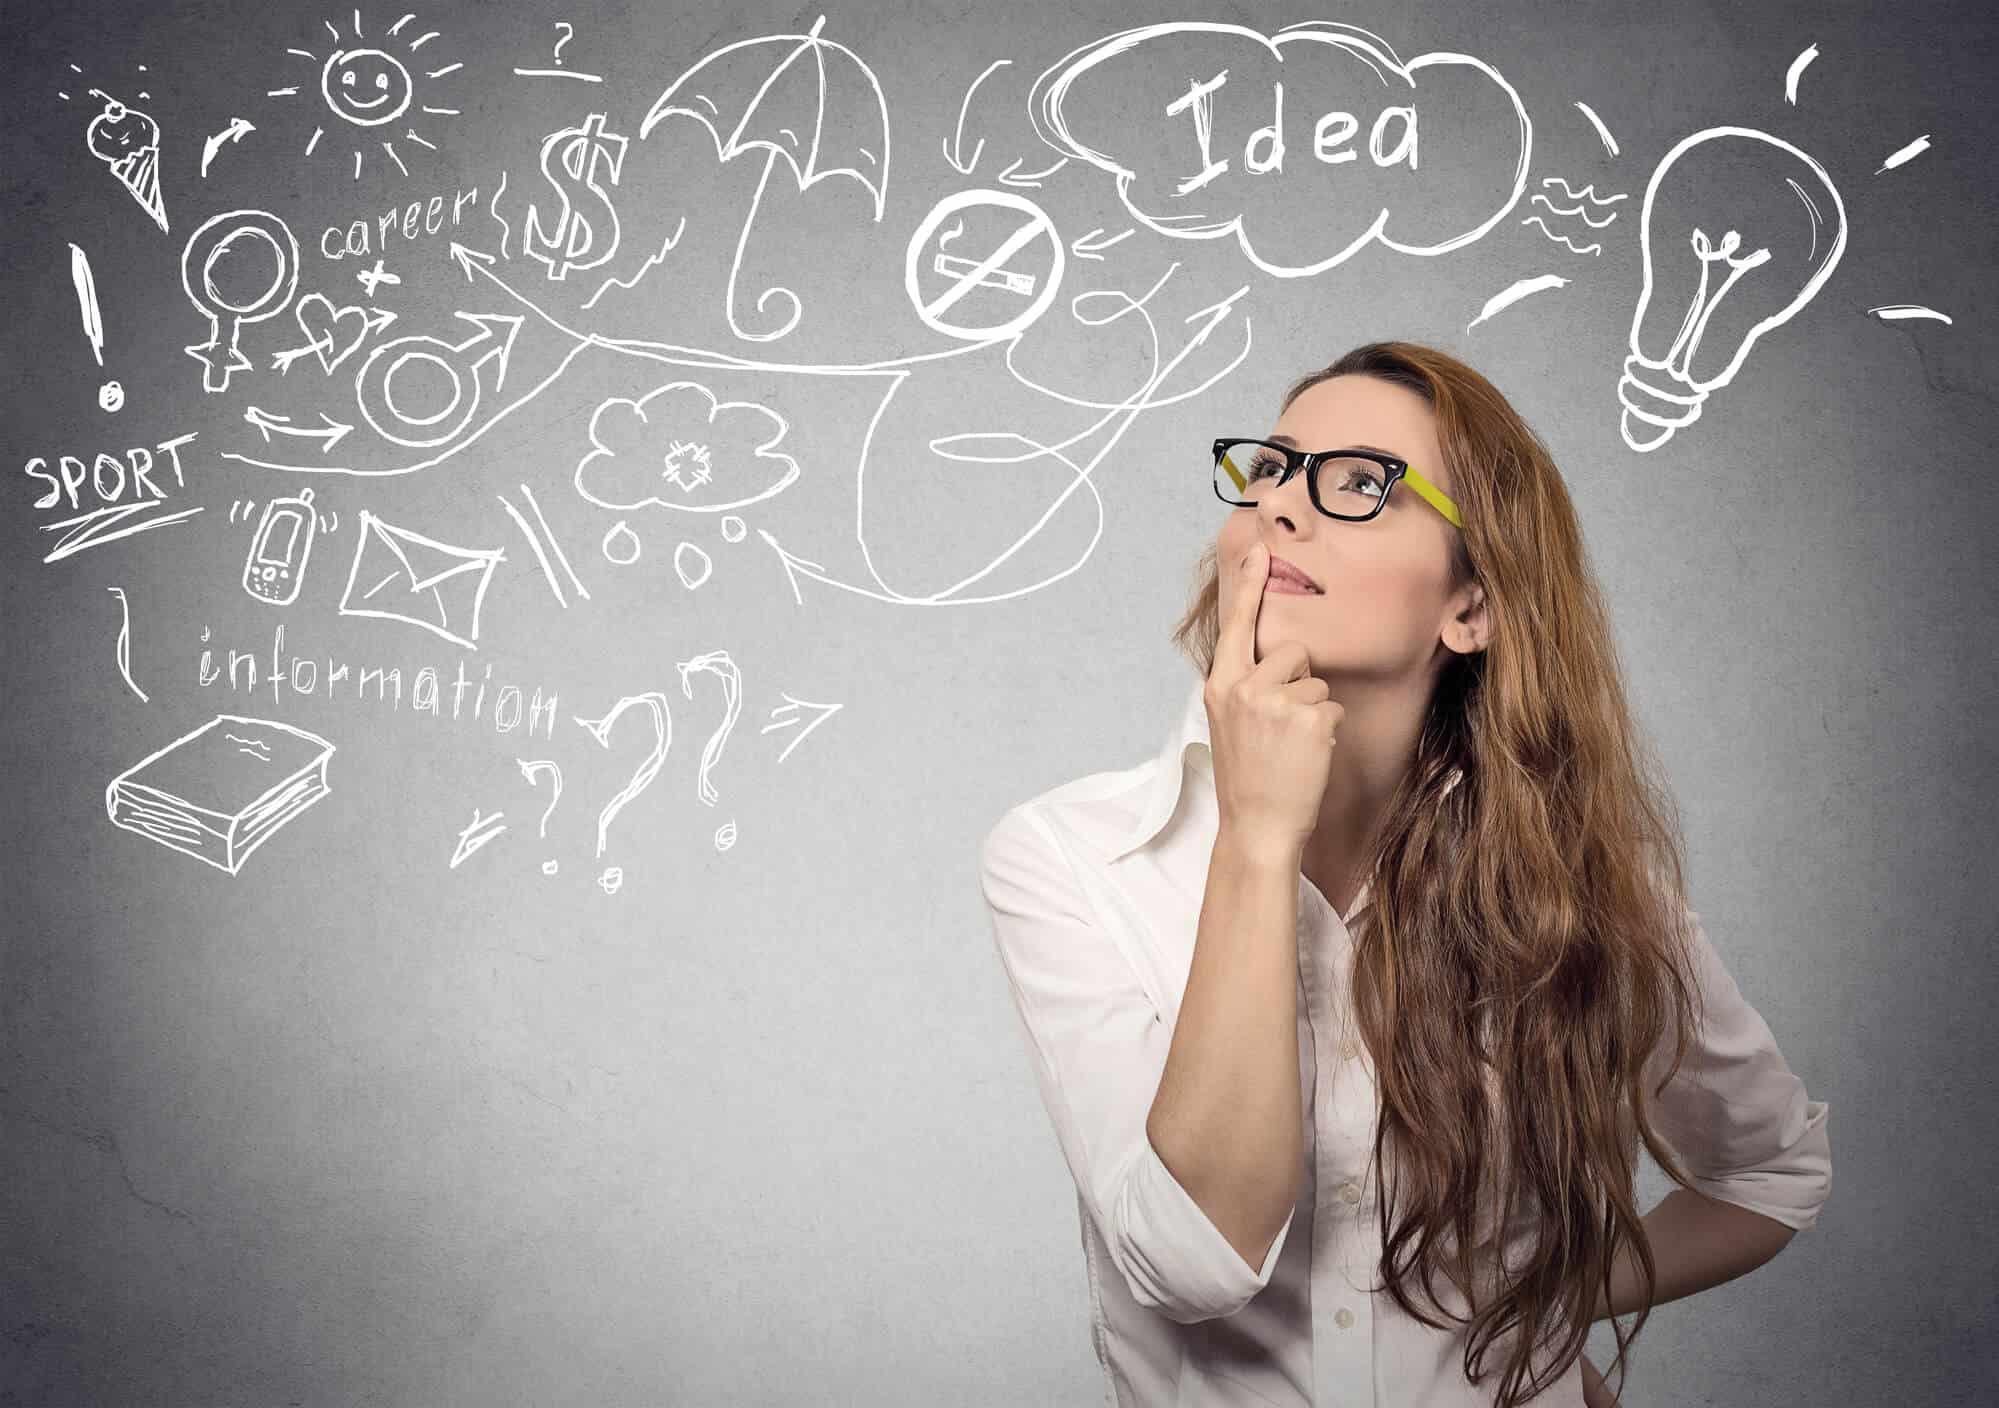 5 Profitable Business Ideas to Start